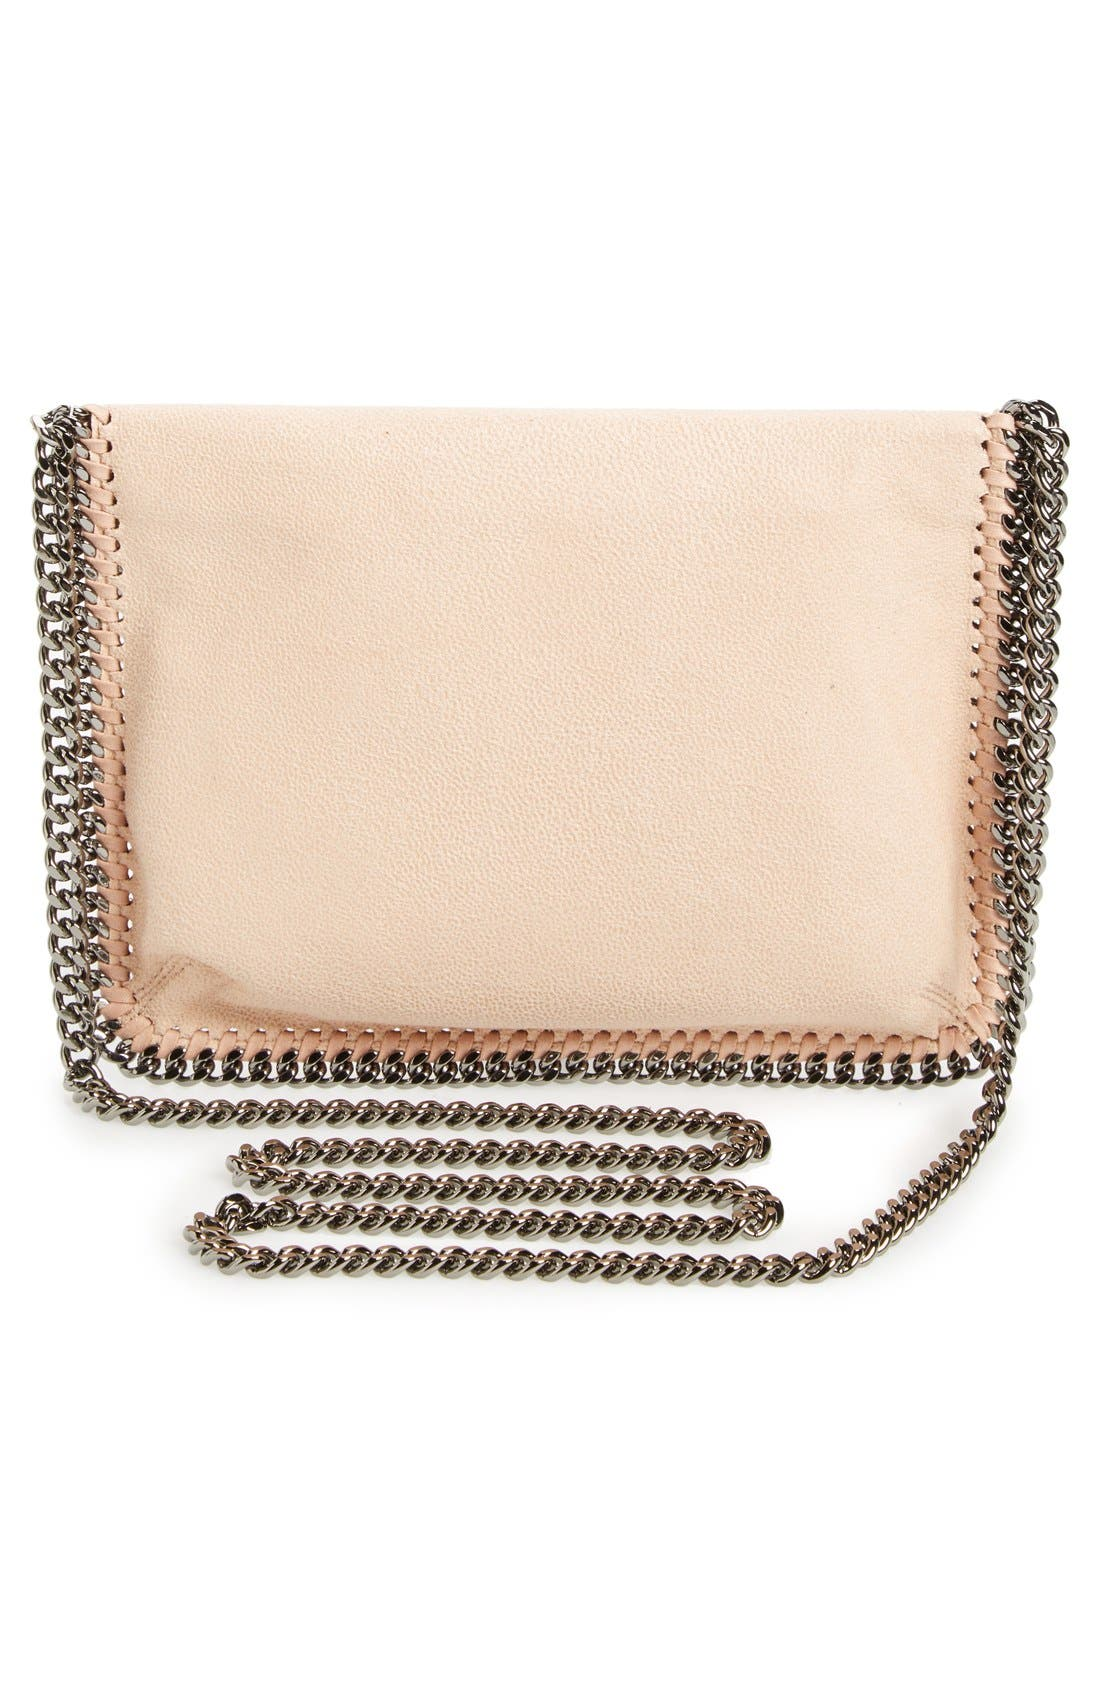 Alternate Image 3  - Stella McCartney 'Mini Falabella - Shaggy Deer' Faux Leather Crossbody Bag